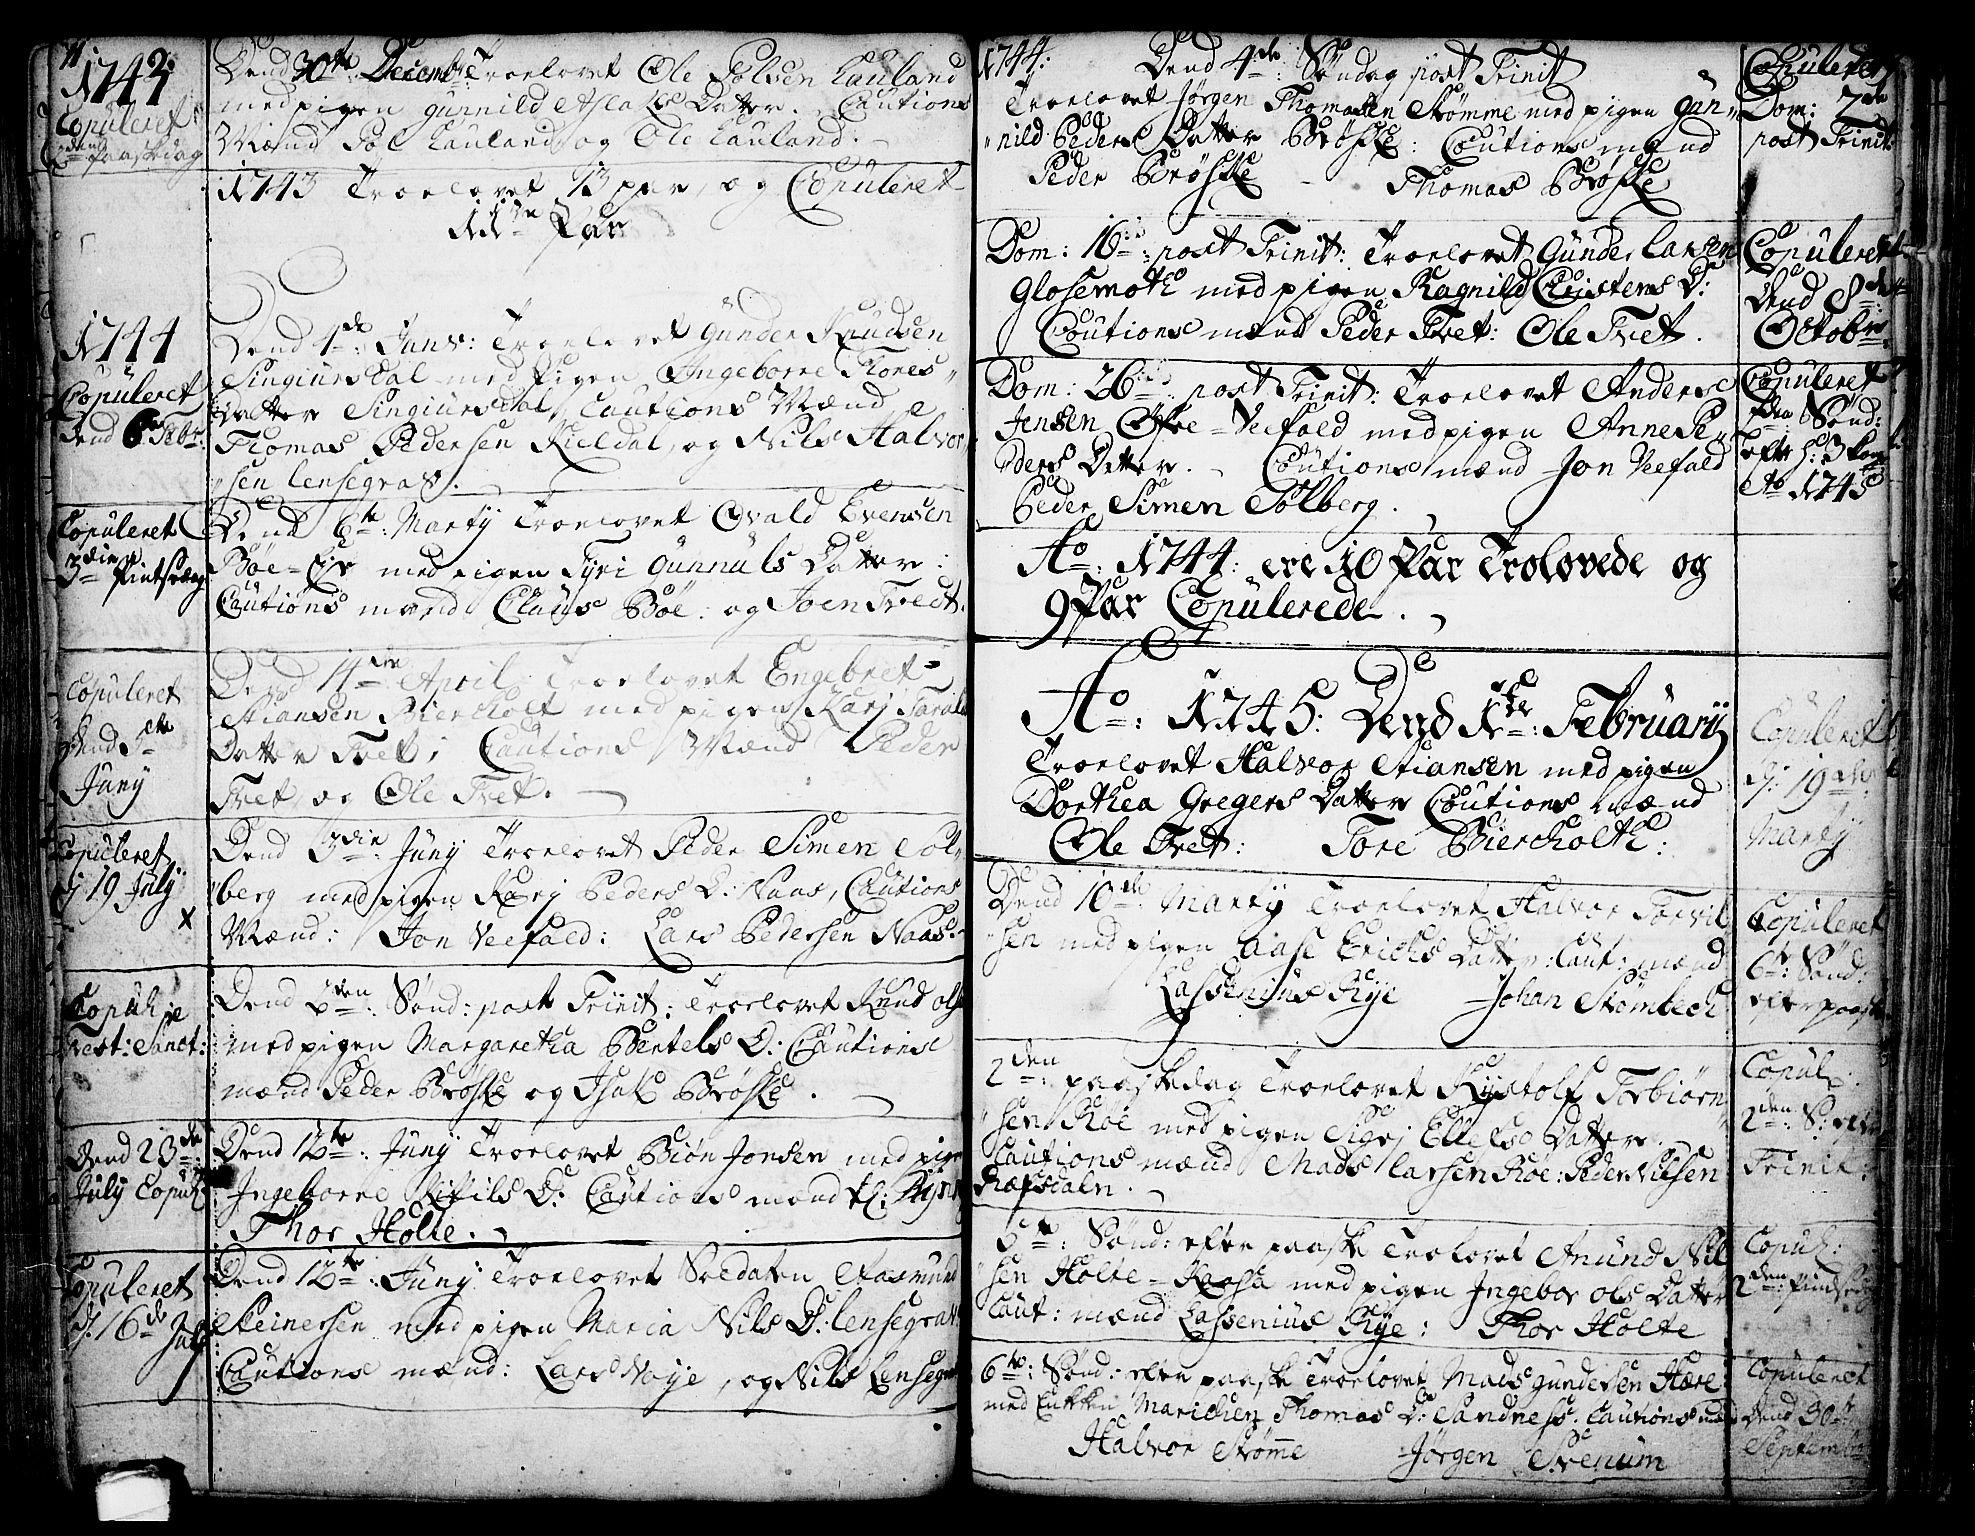 SAKO, Drangedal kirkebøker, F/Fa/L0002: Ministerialbok nr. 2, 1733-1753, s. 11-12